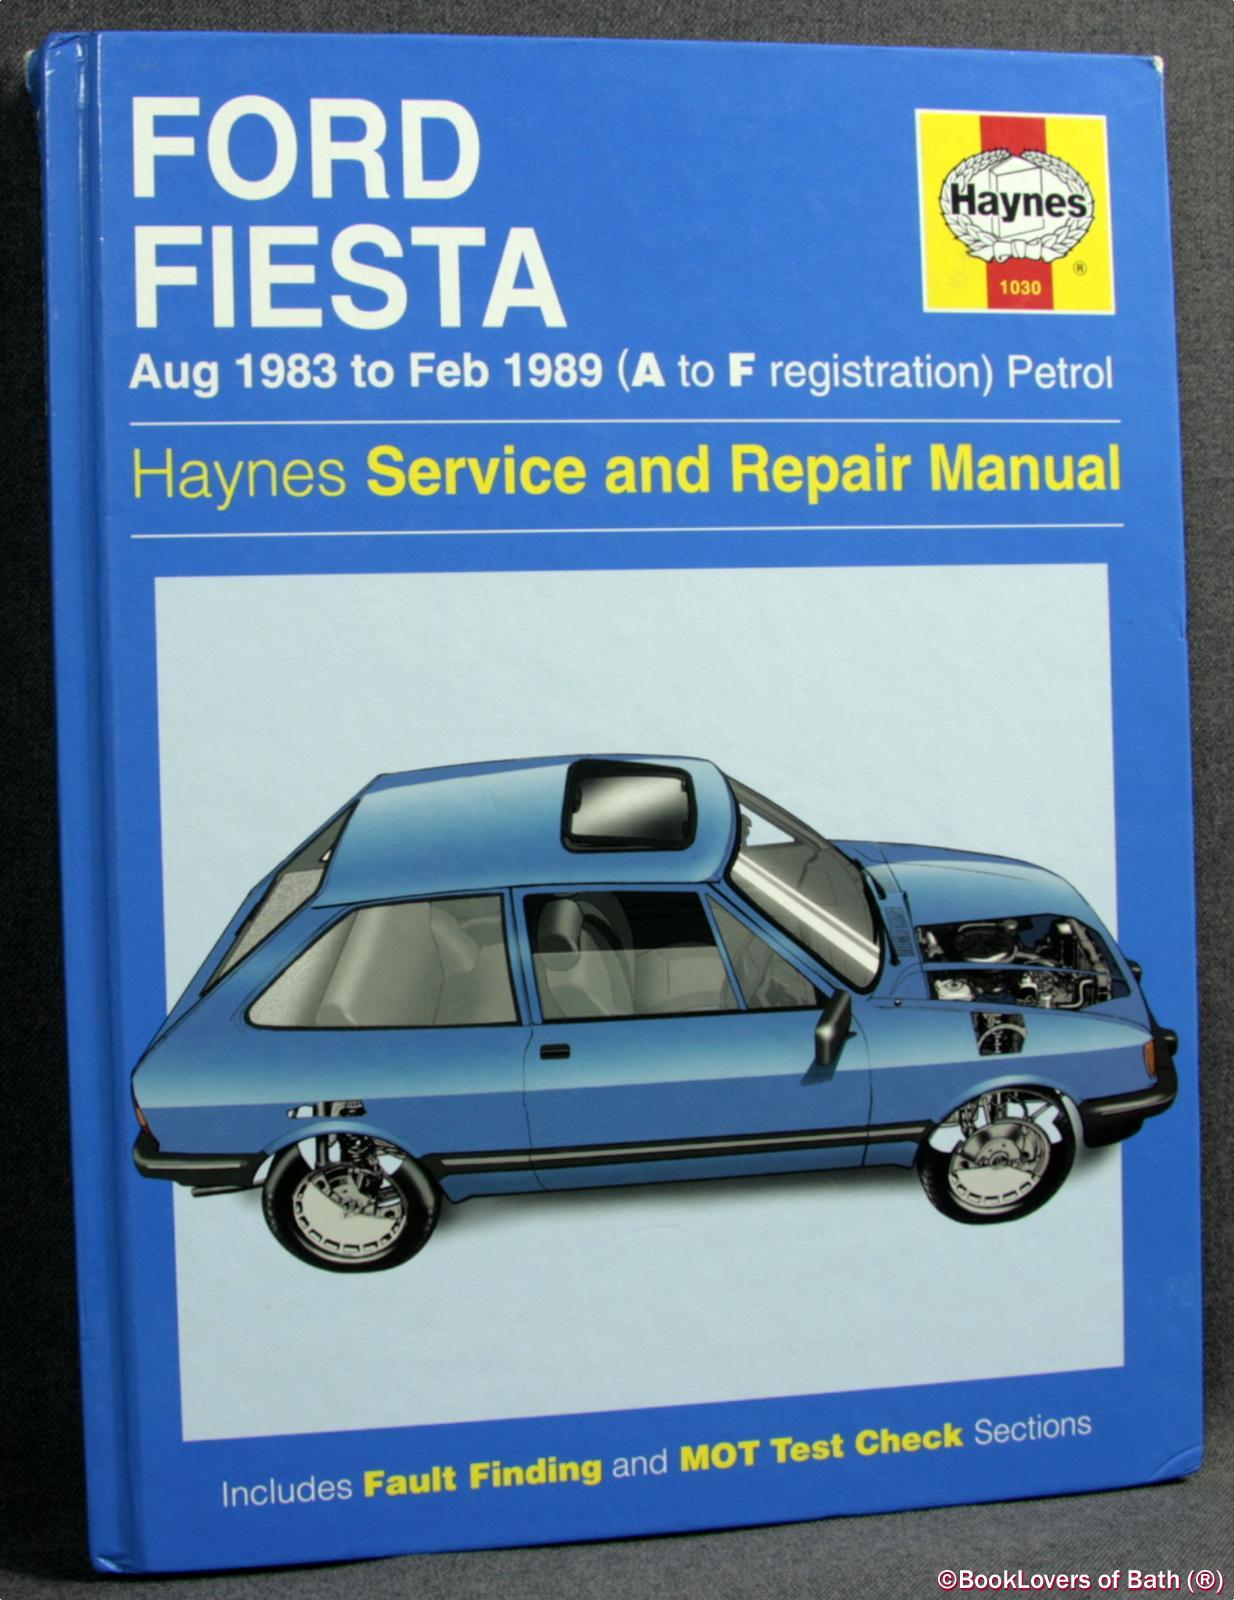 форд фиеста инструкция 1983